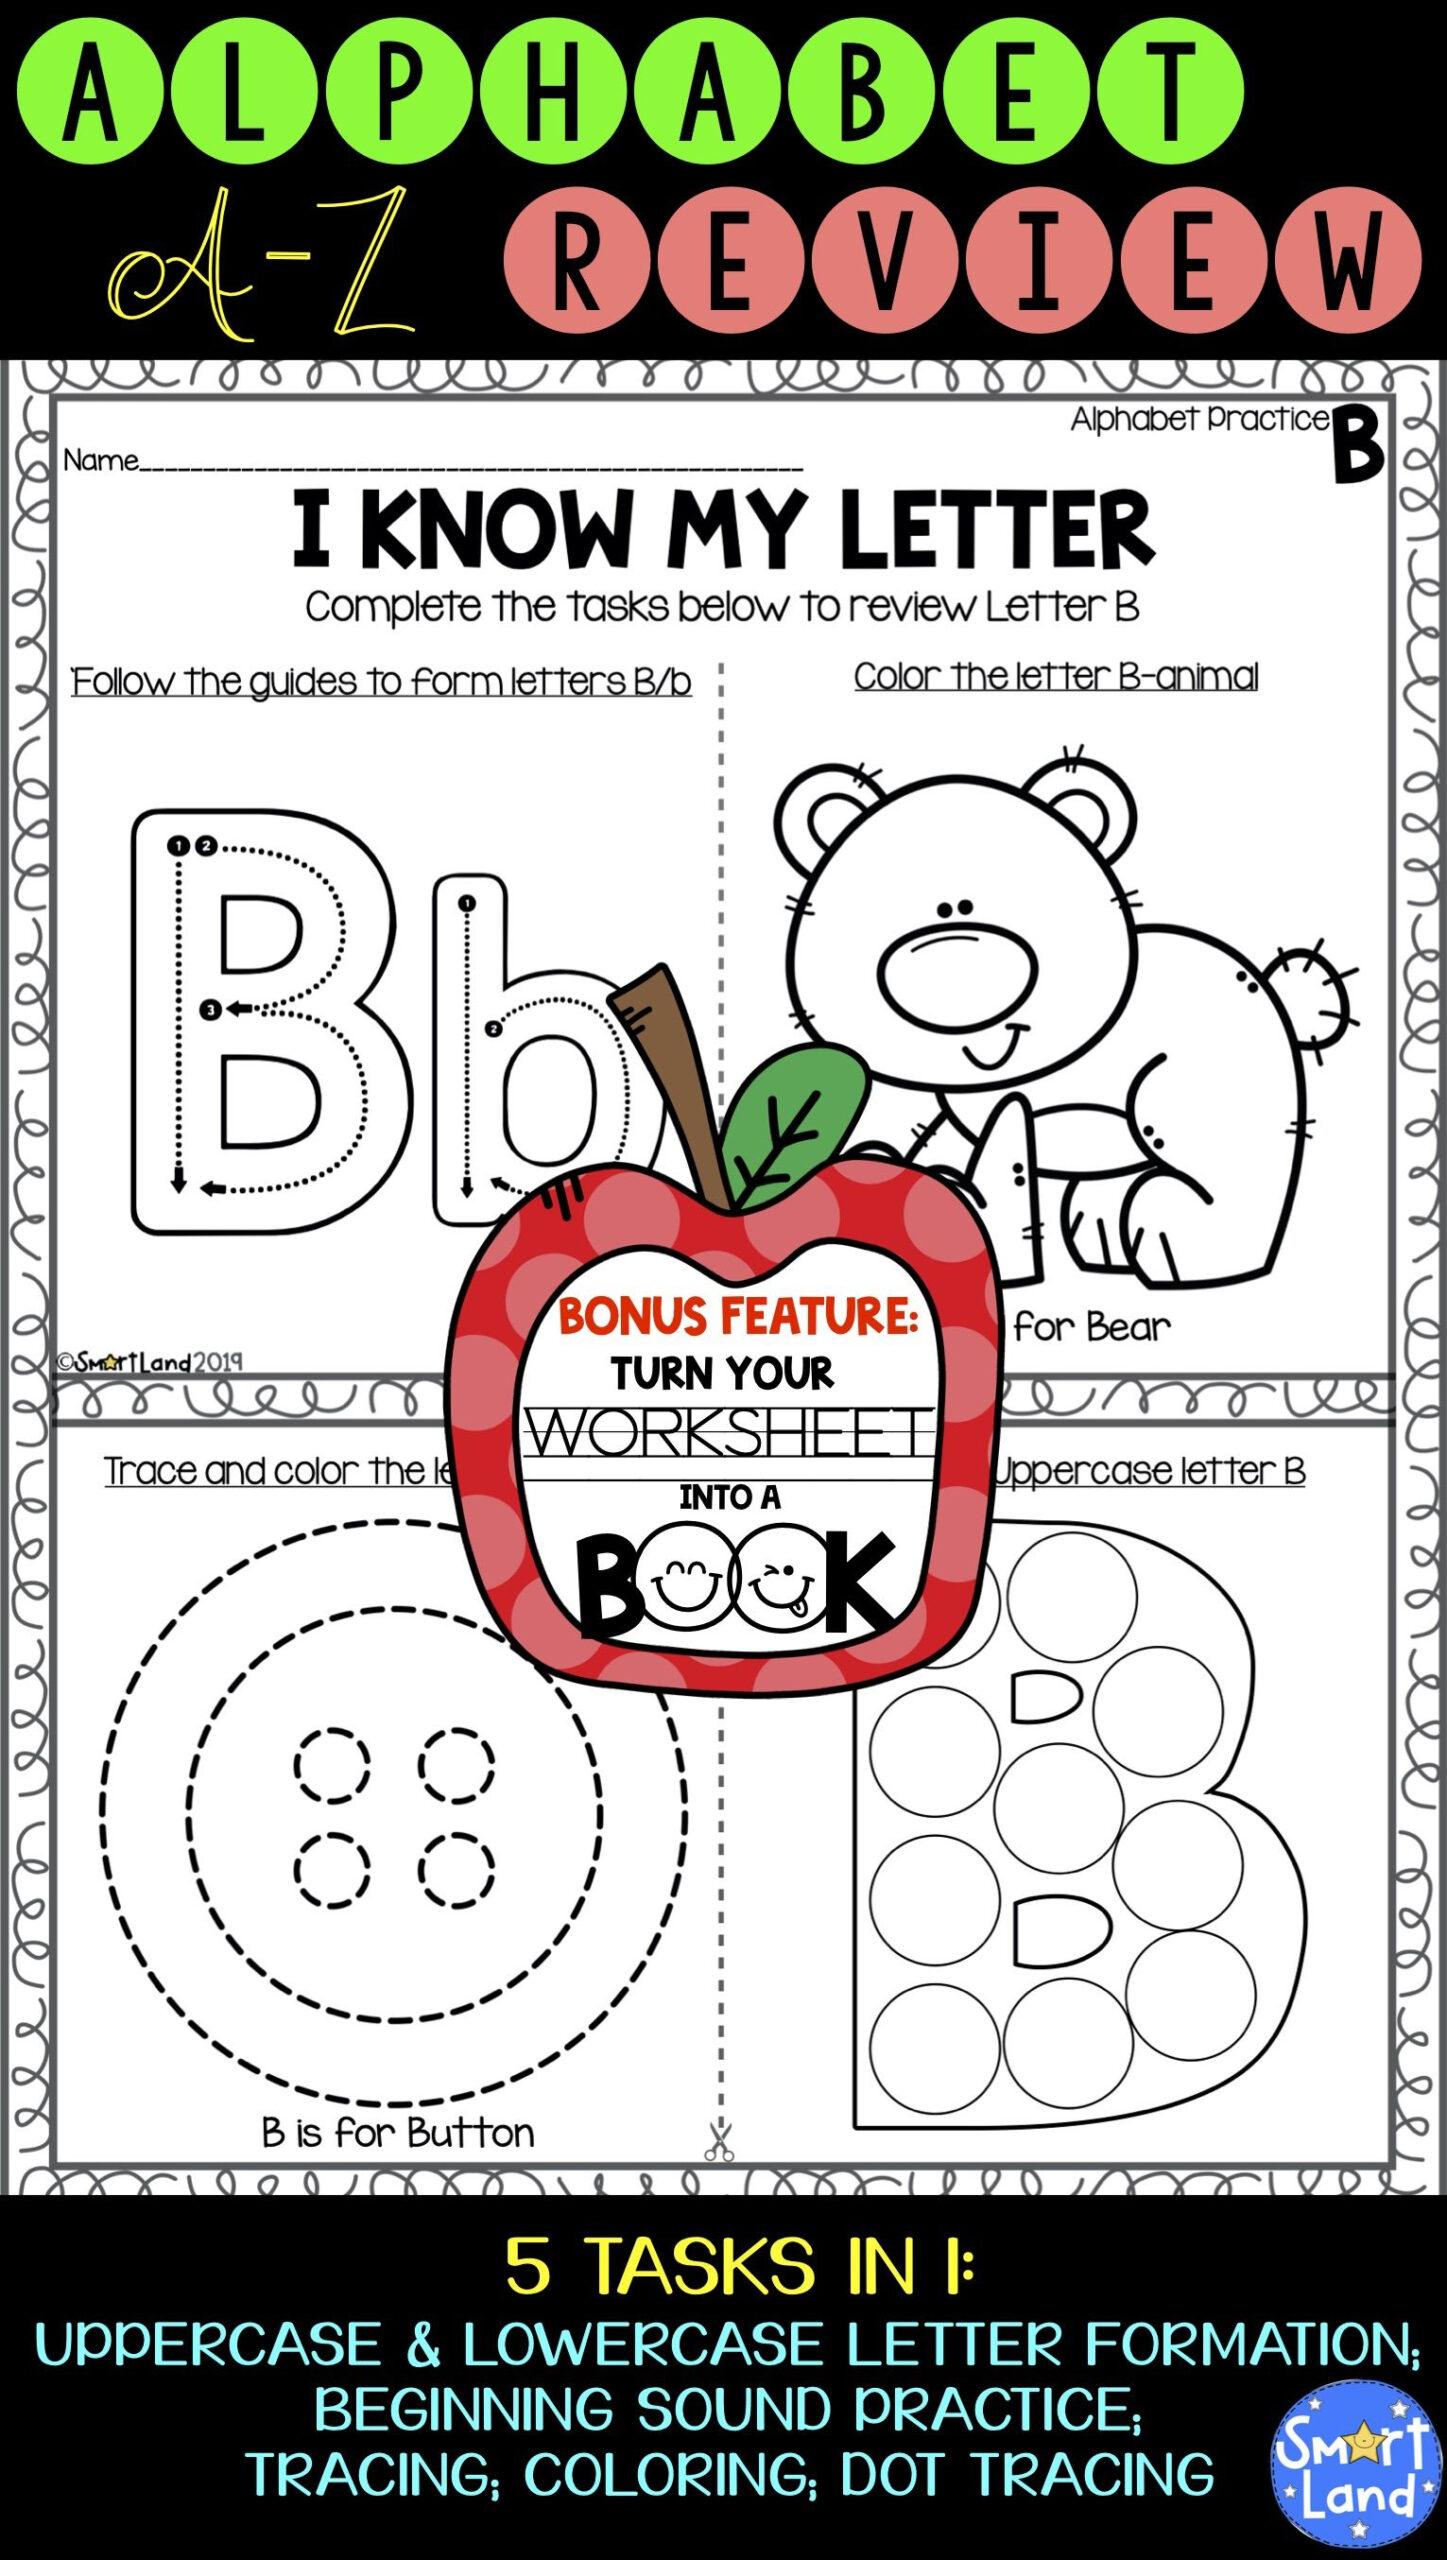 Alphabet Practice_2In1_Review+Book | Alphabet Worksheets intended for Alphabet Review Worksheets For Pre-K